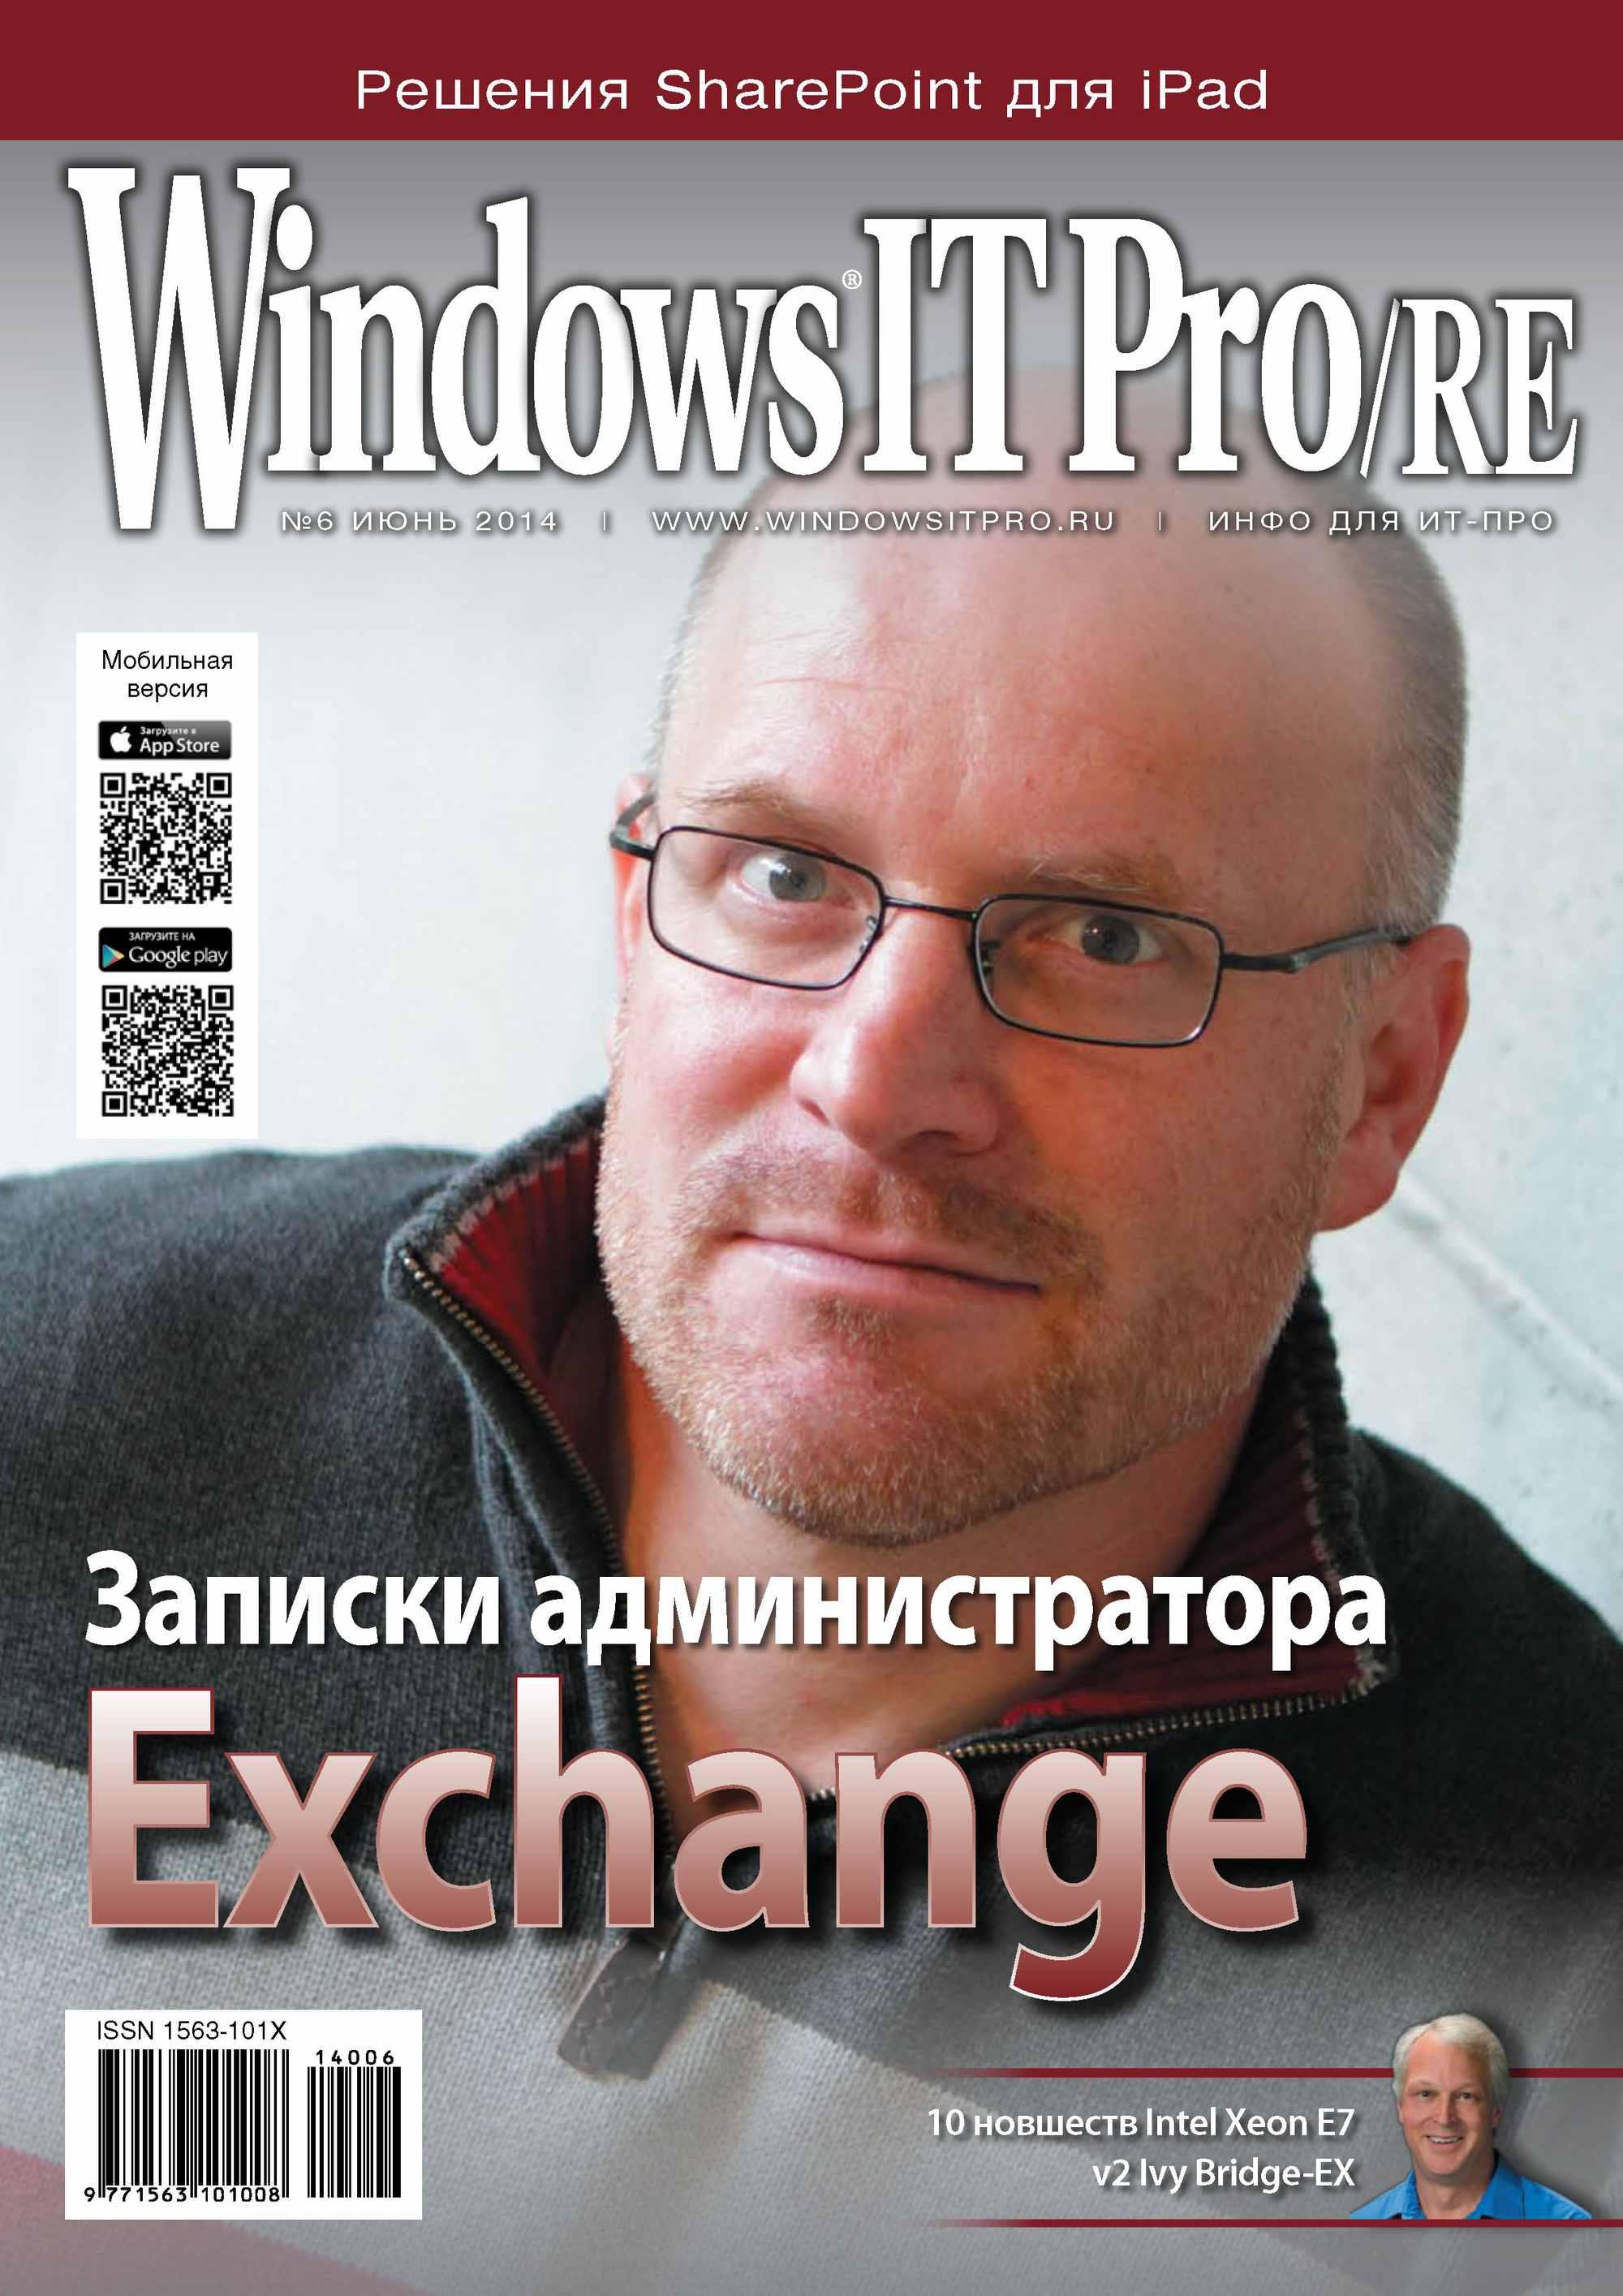 Открытые системы Windows IT Pro/RE №06/2014 открытые системы windows it pro re 01 2014